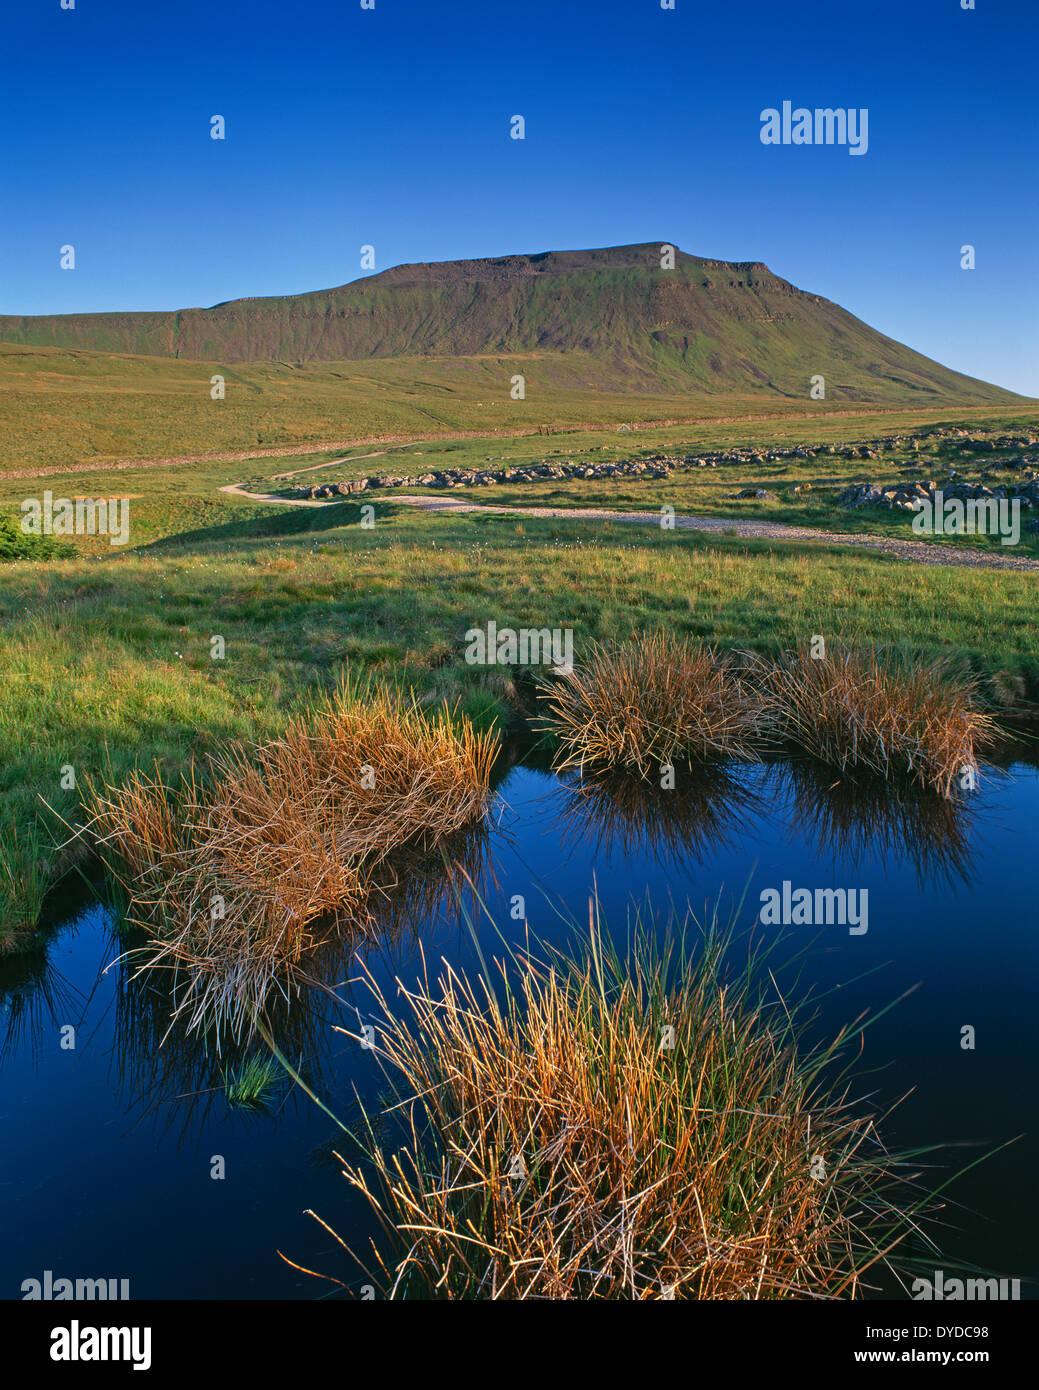 Ingleborough betrachtet von Southerscales Nature Reserve. Stockbild